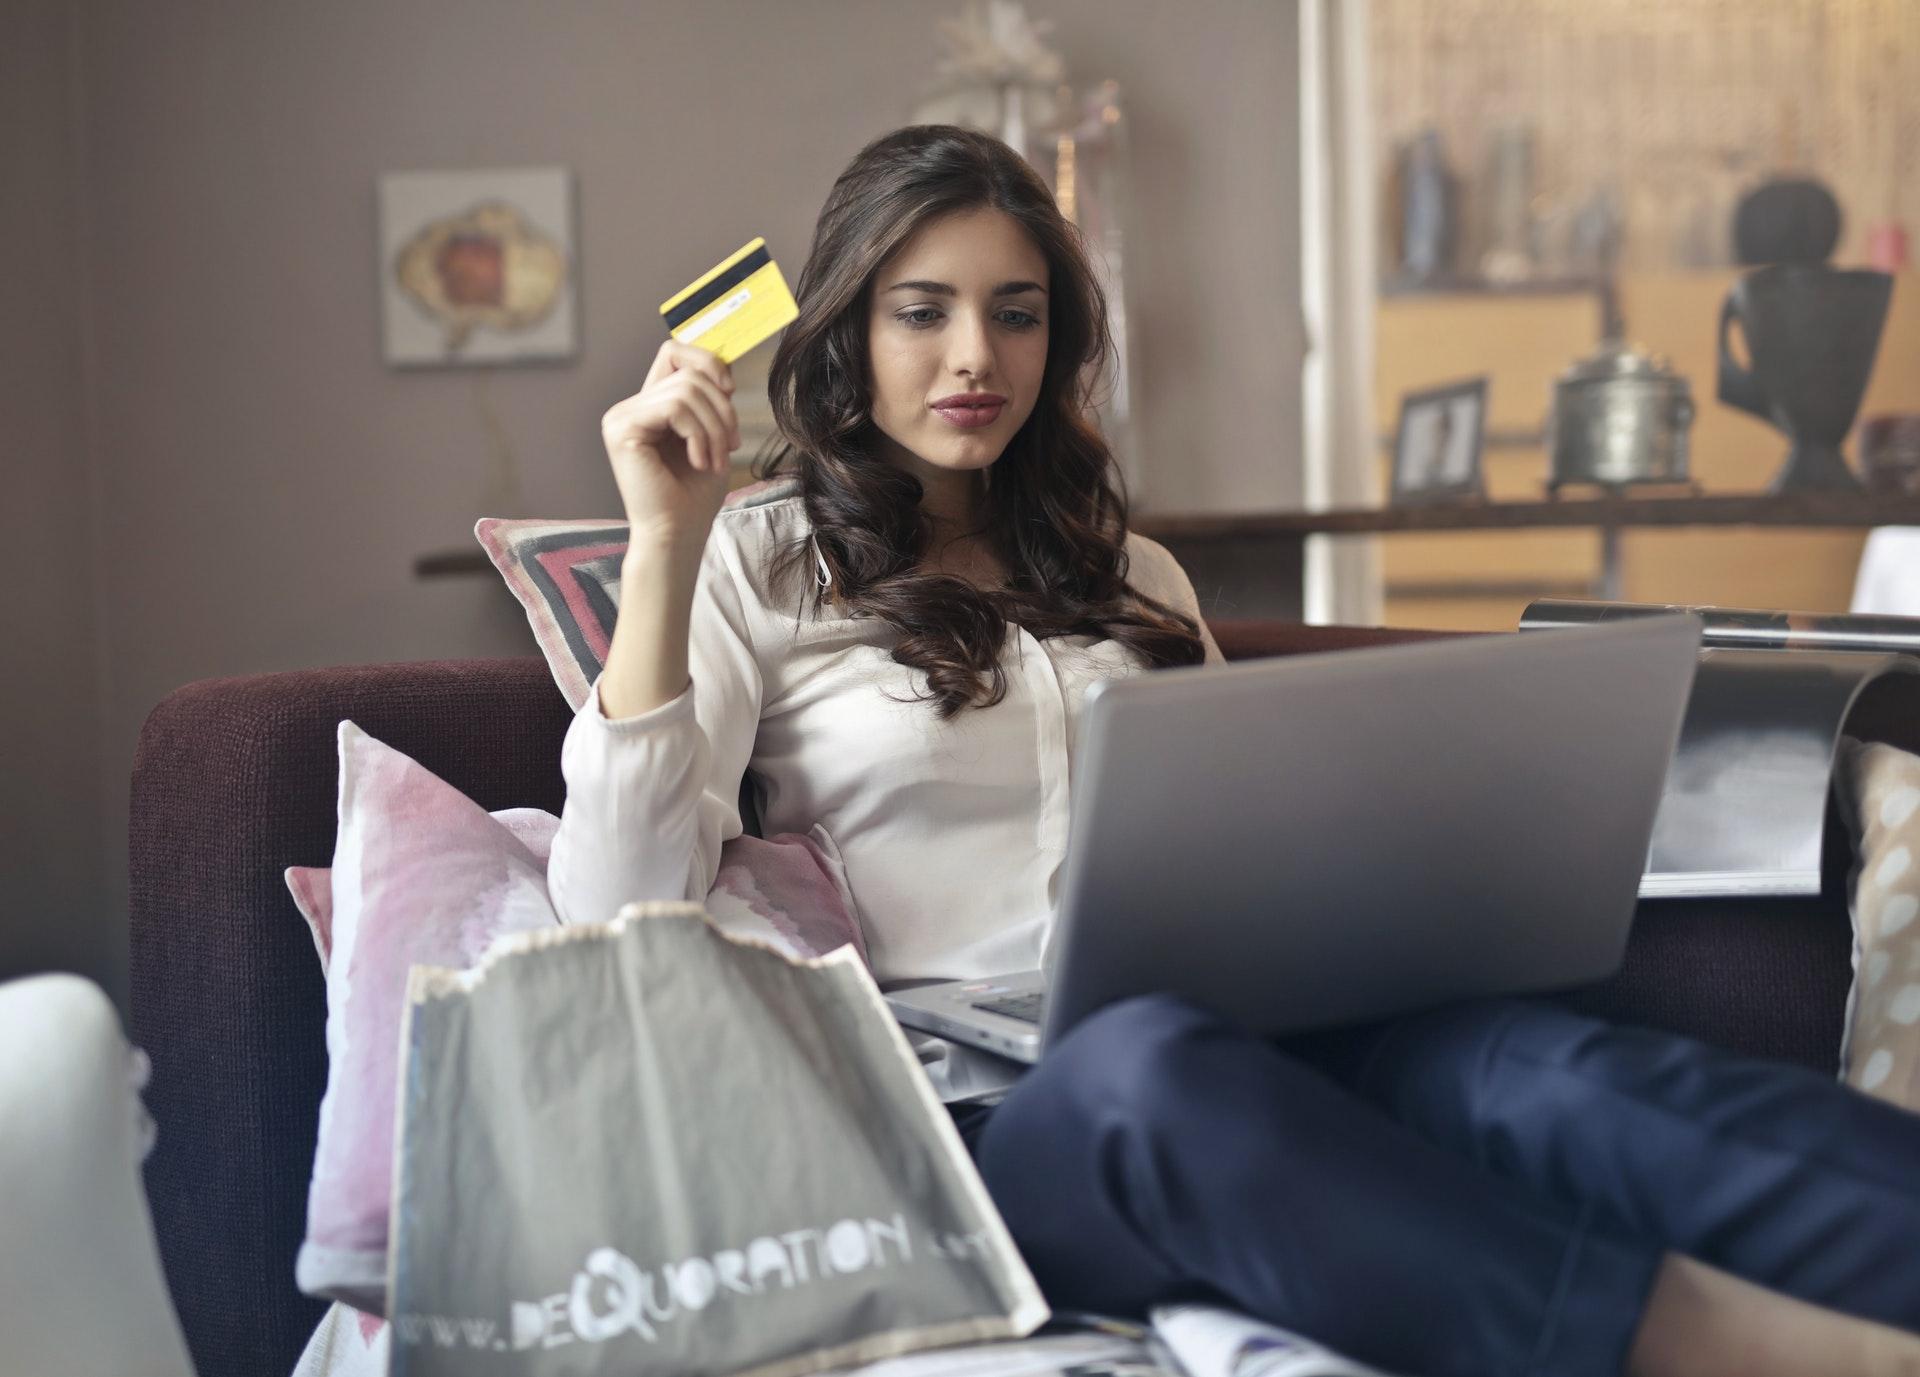 Woman online purchasing